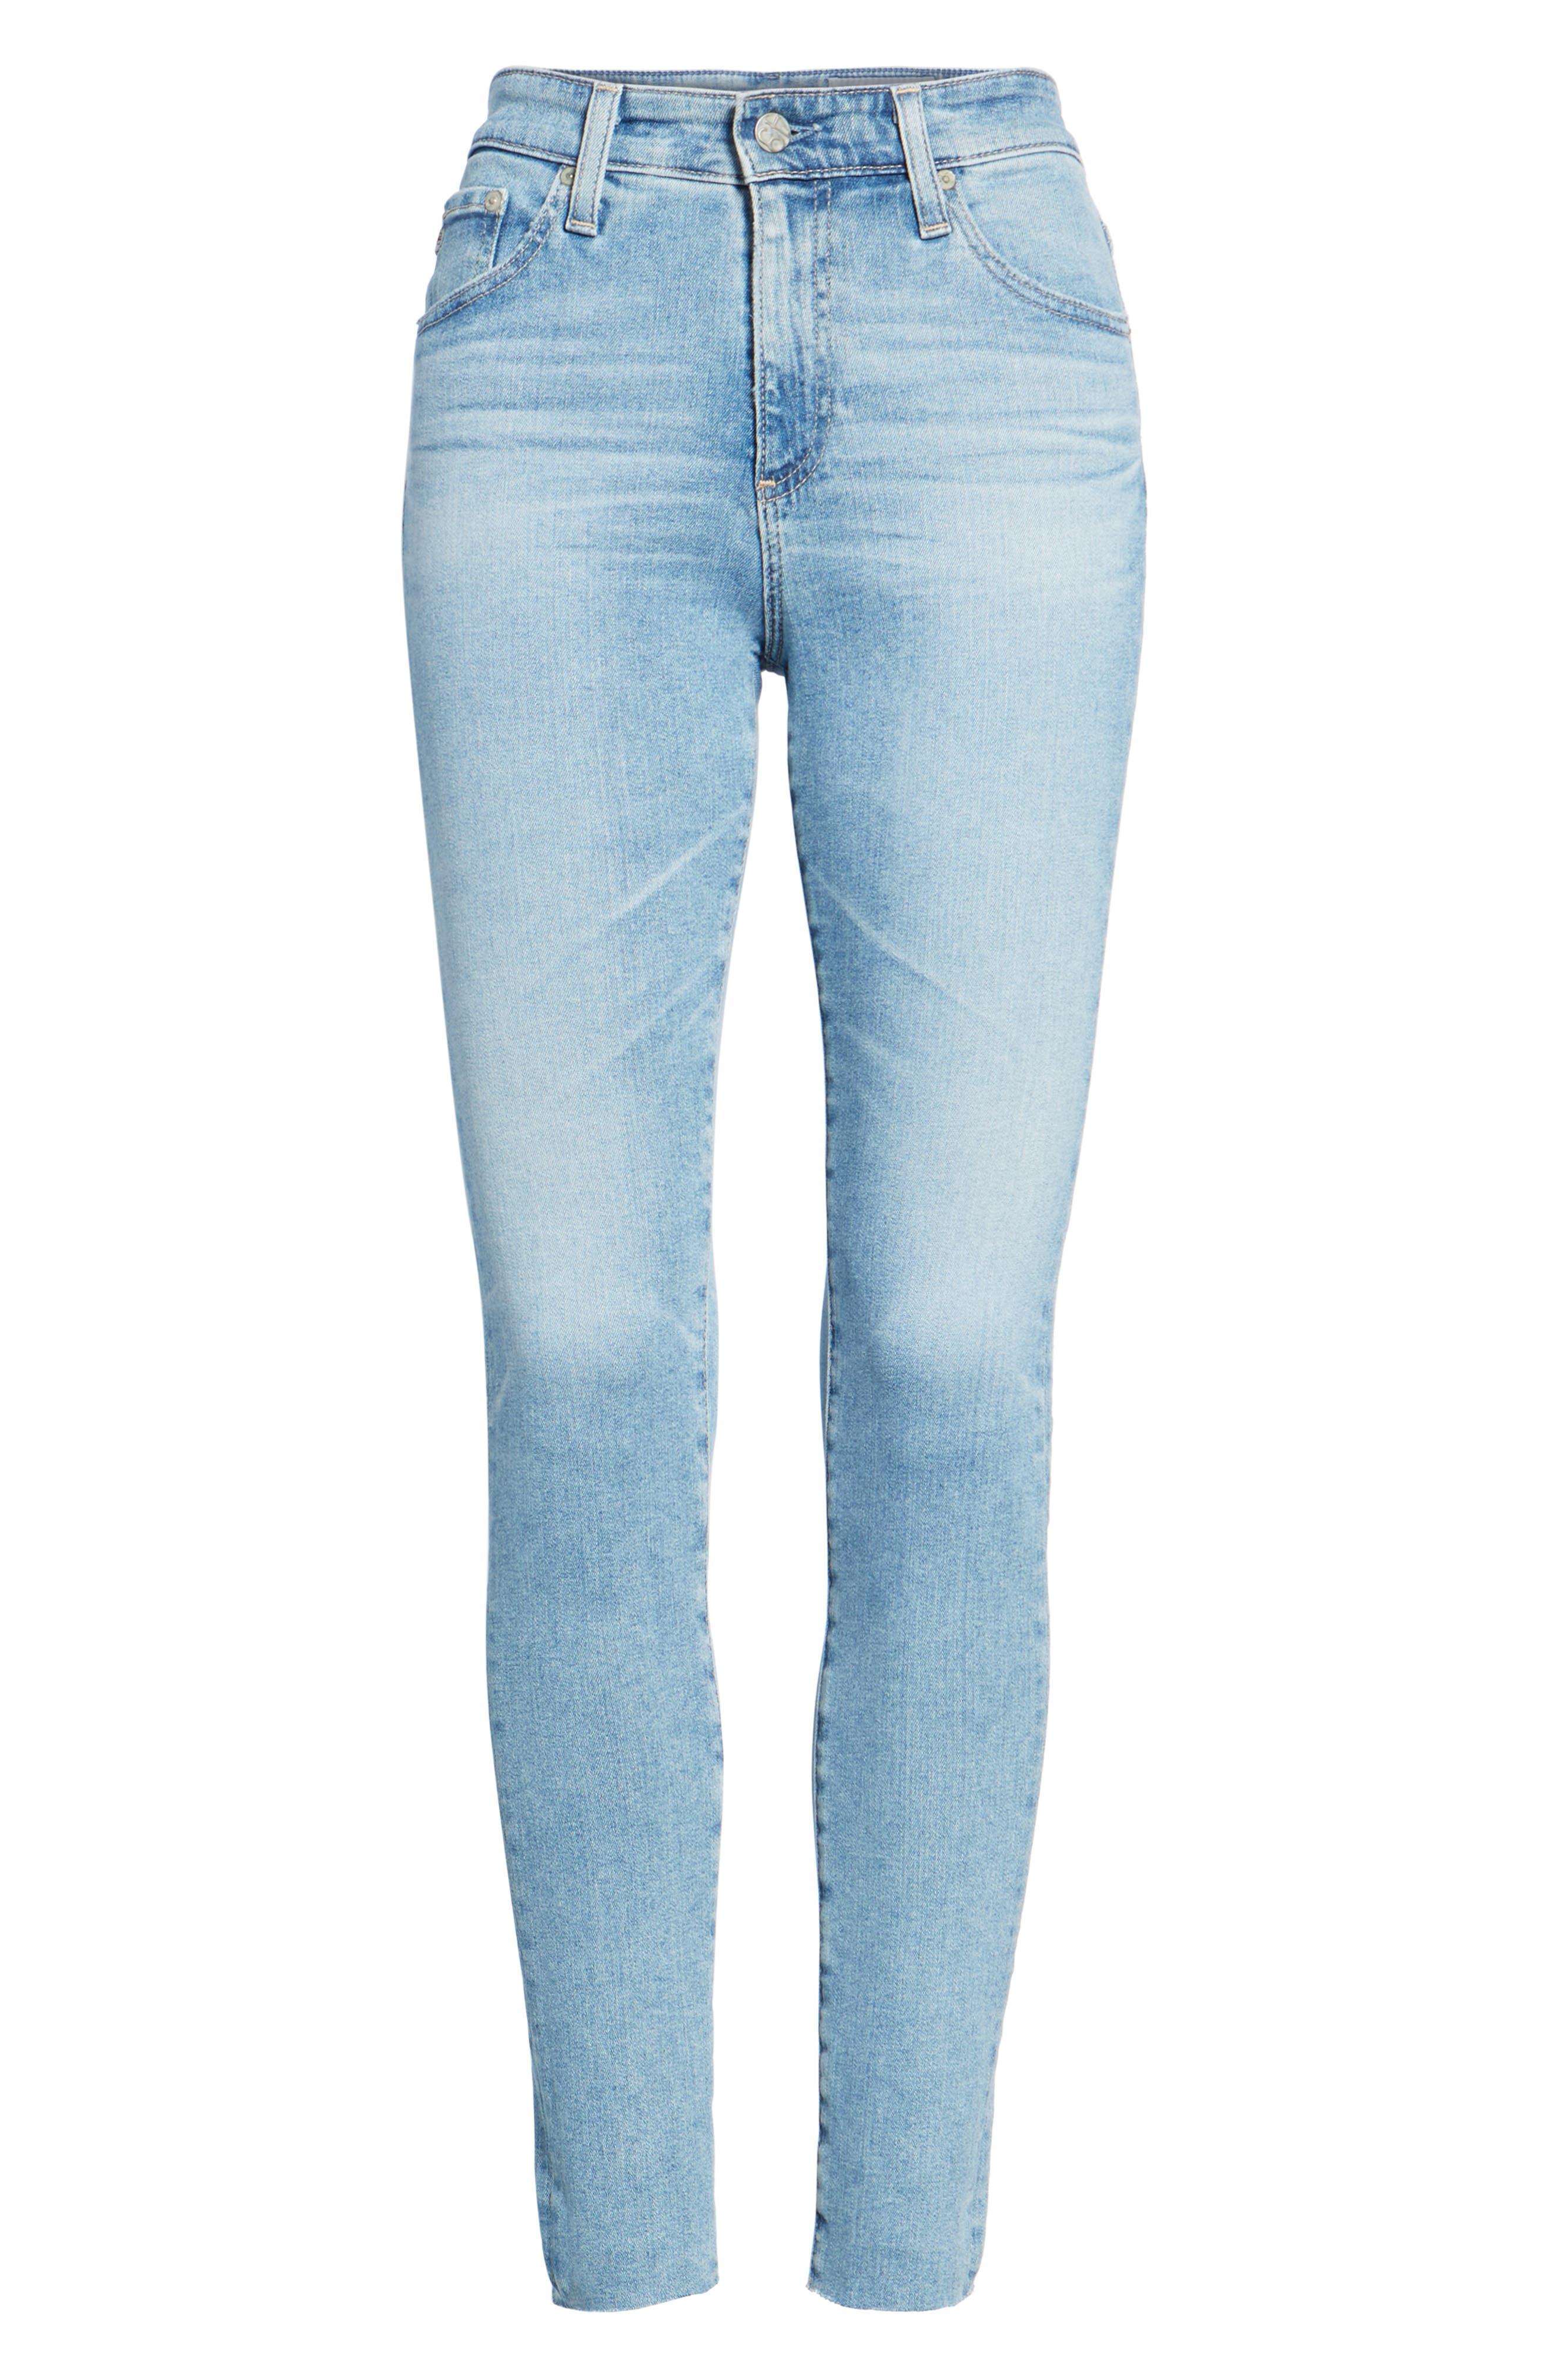 The Farrah High Waist Ankle Skinny Jeans,                             Alternate thumbnail 7, color,                             18 Years Cruising